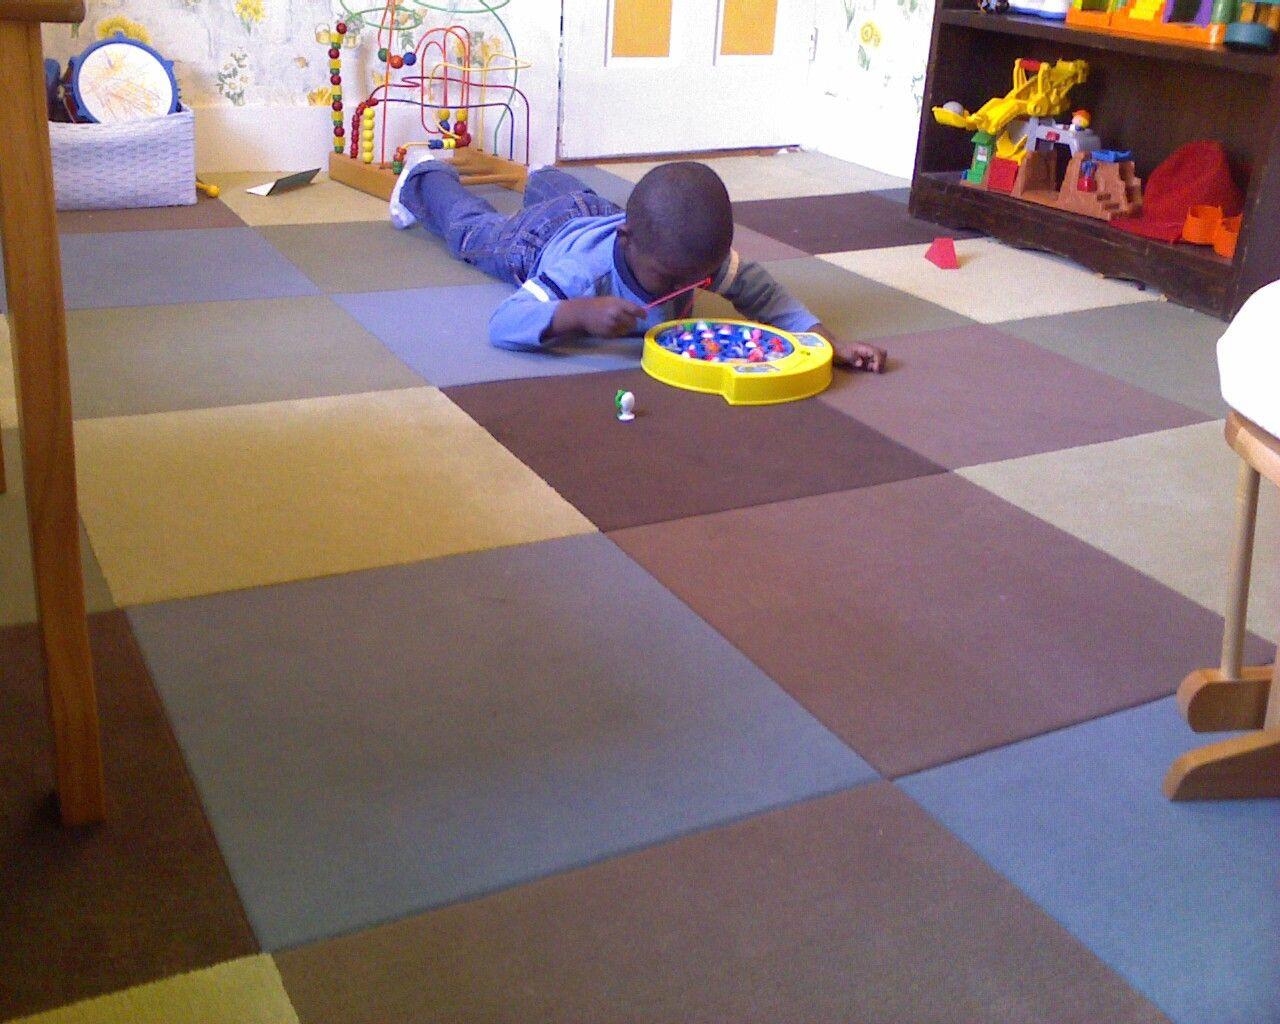 Carpet Tiles For Kids Room  Playroom Flooring